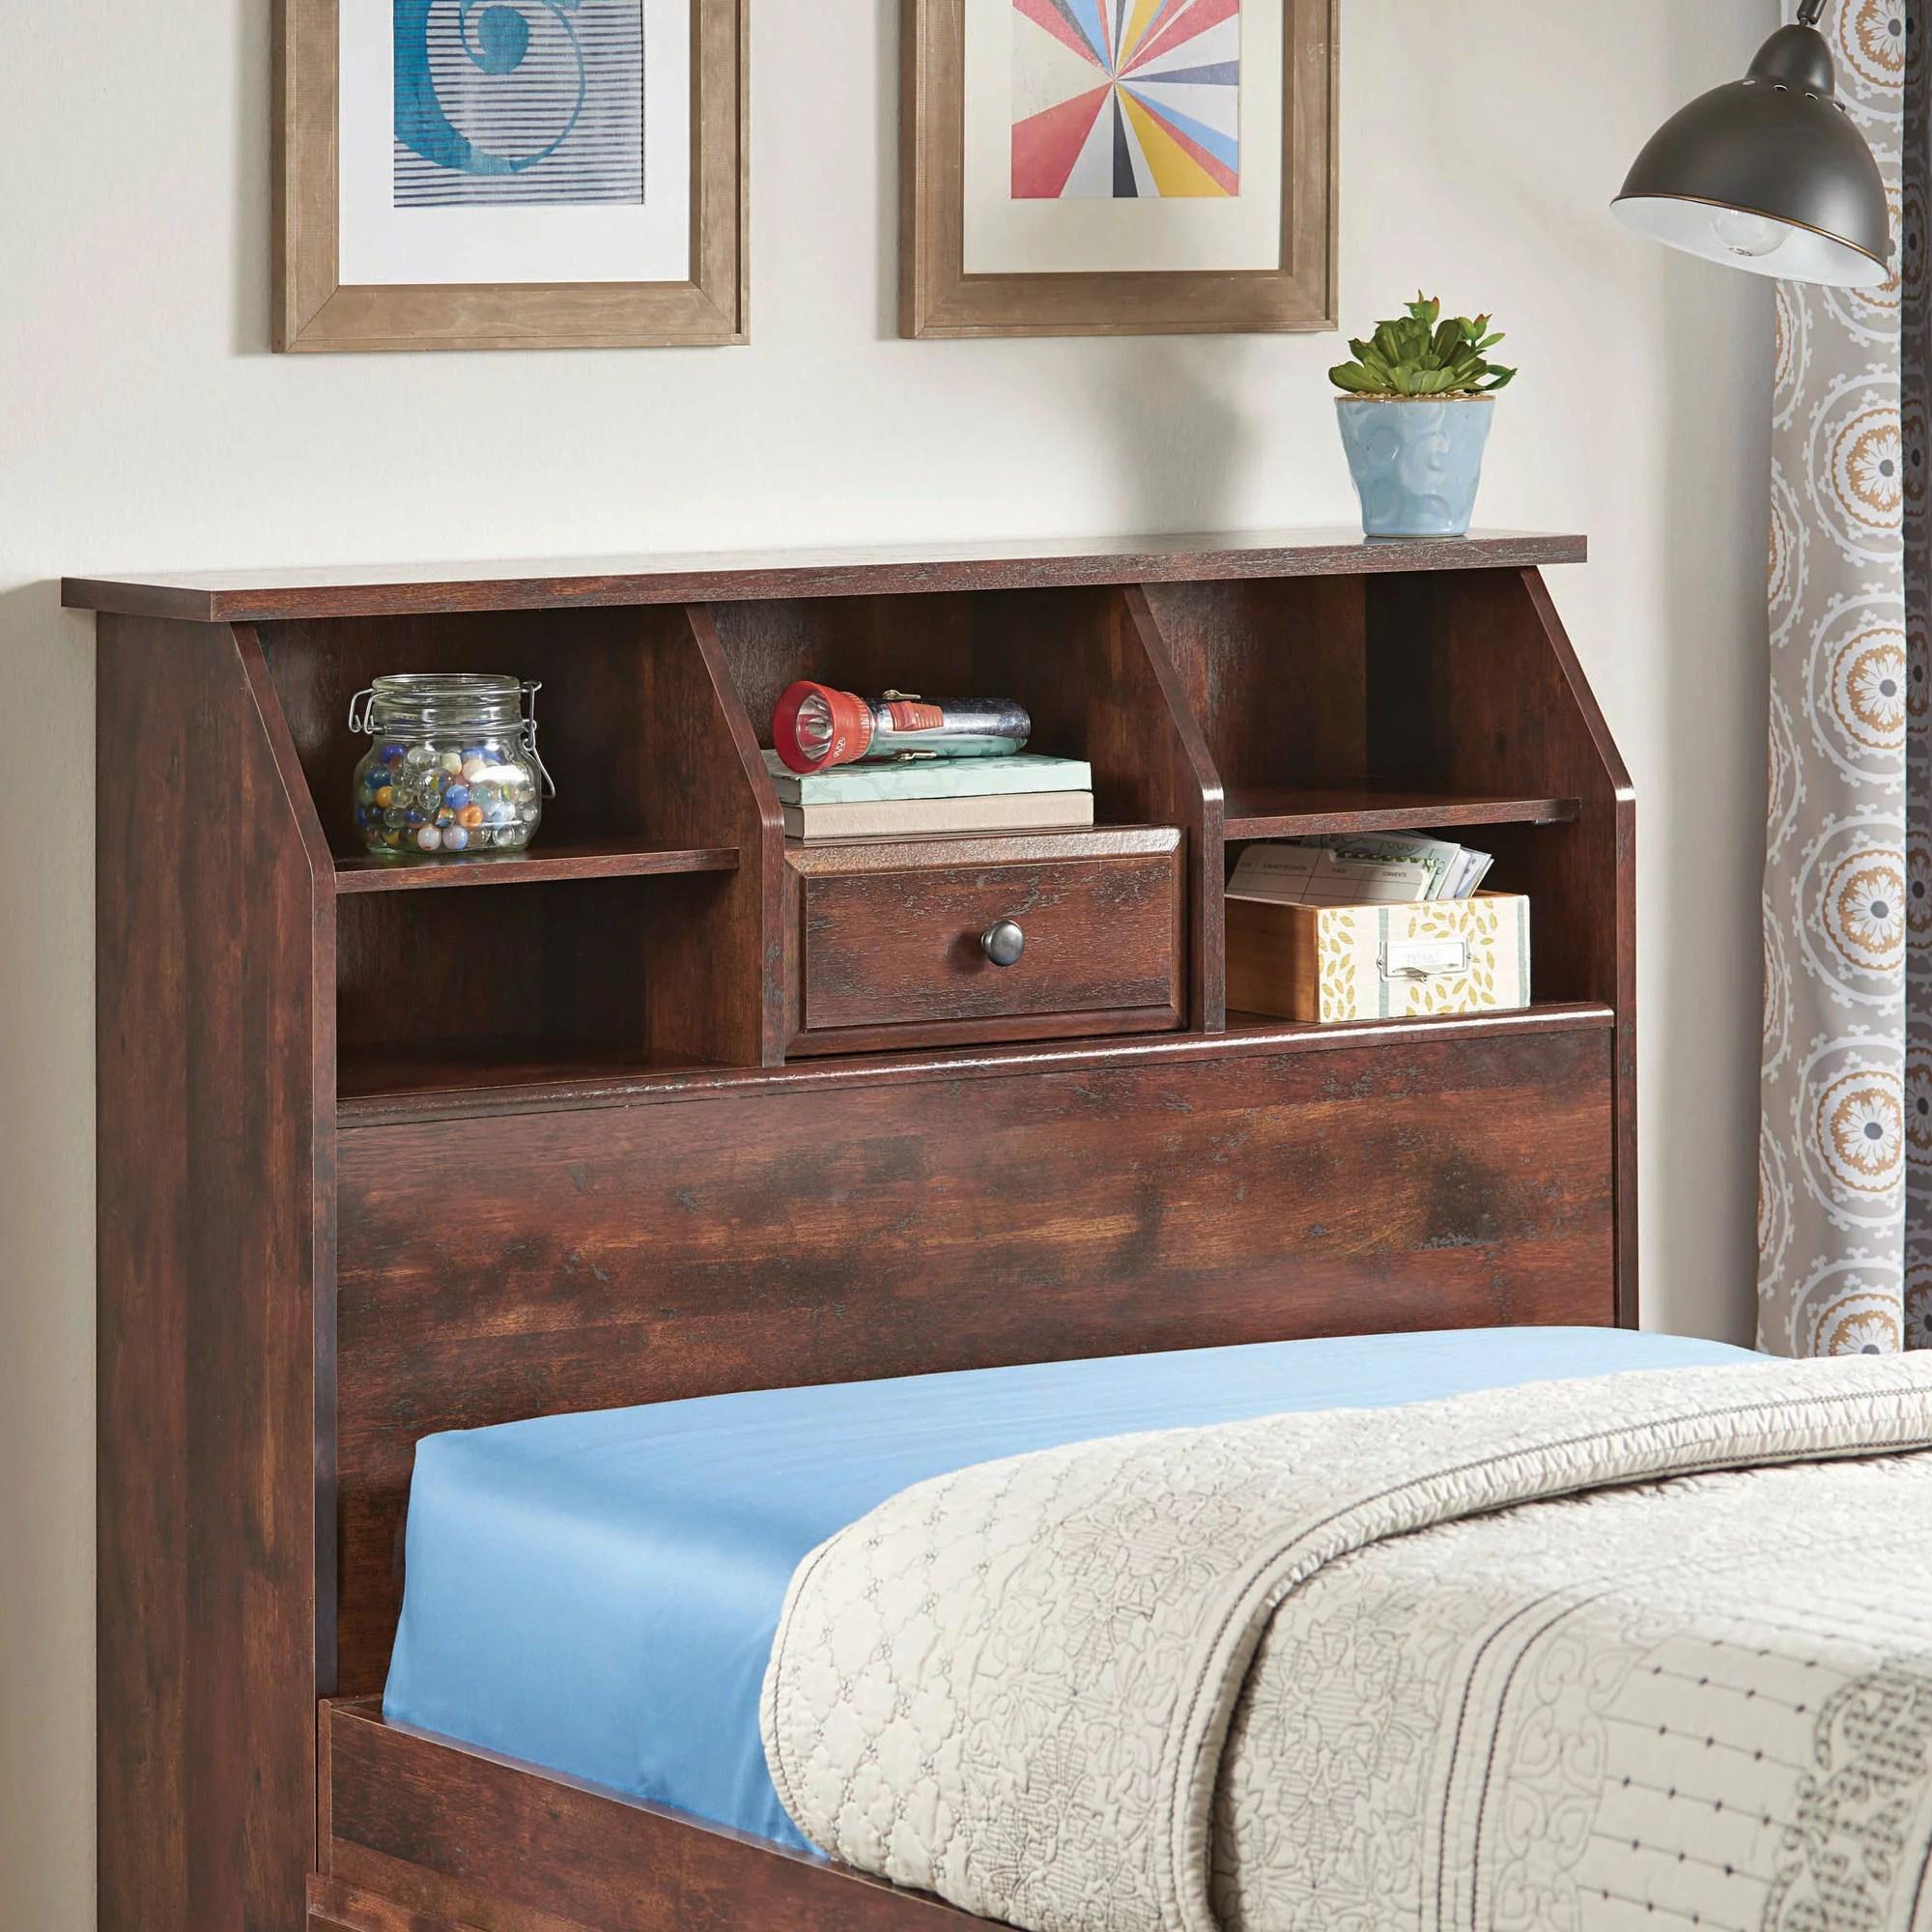 Better Homes Gardens Leighton Twin Bookcase Headboard Rustic Cherry Finish Walmart Com Walmart Com